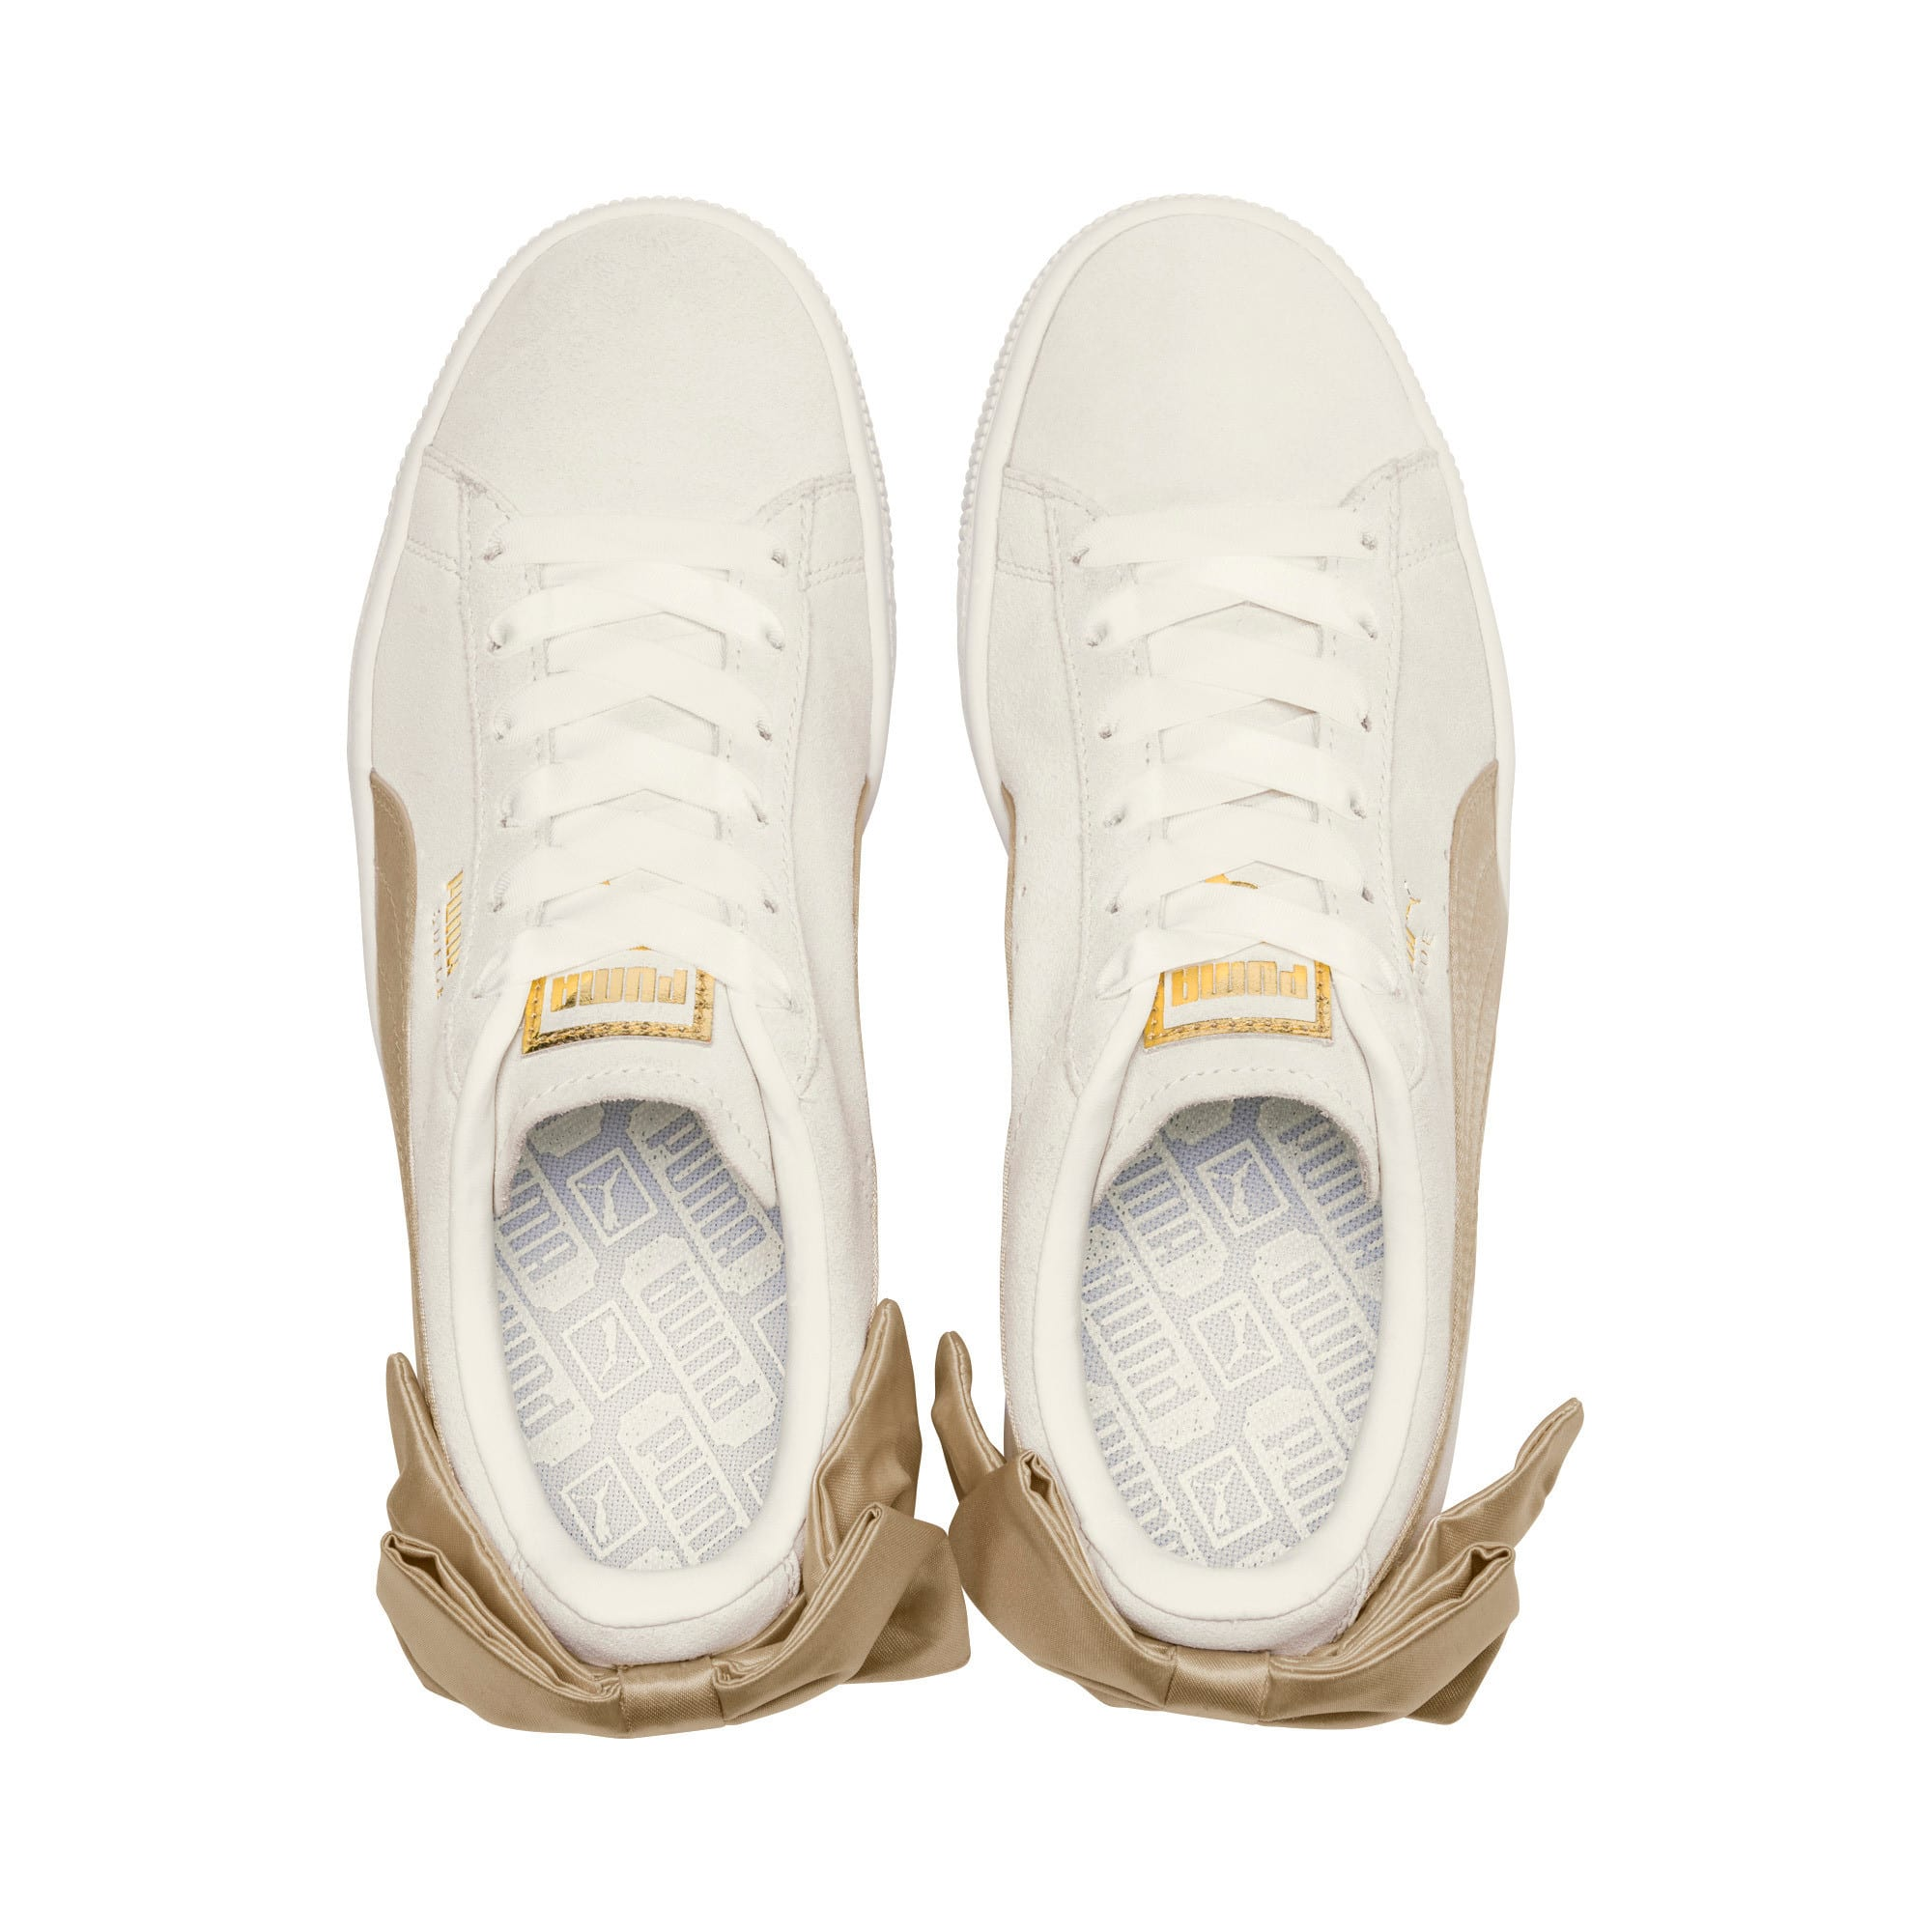 Thumbnail 6 of Suede Bow Varsity Women's Sneakers, Marshmallow-Metallic Gold, medium